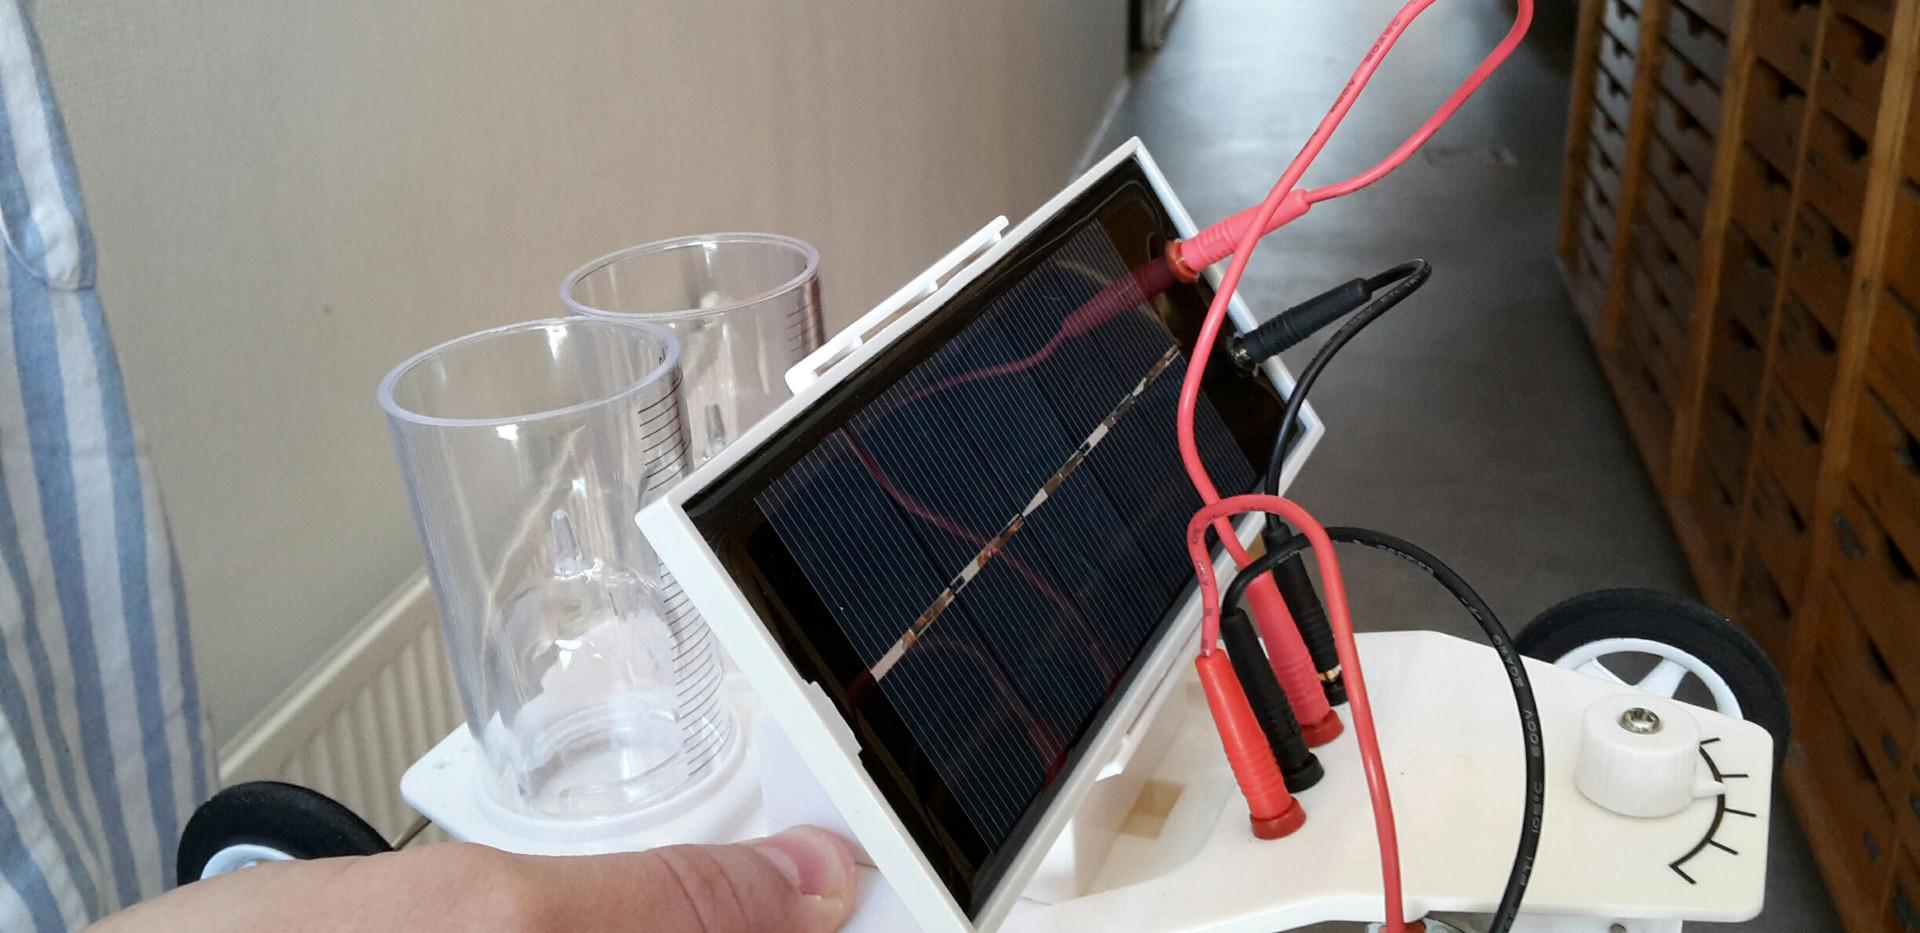 nærbillede_solcellebil.jpg